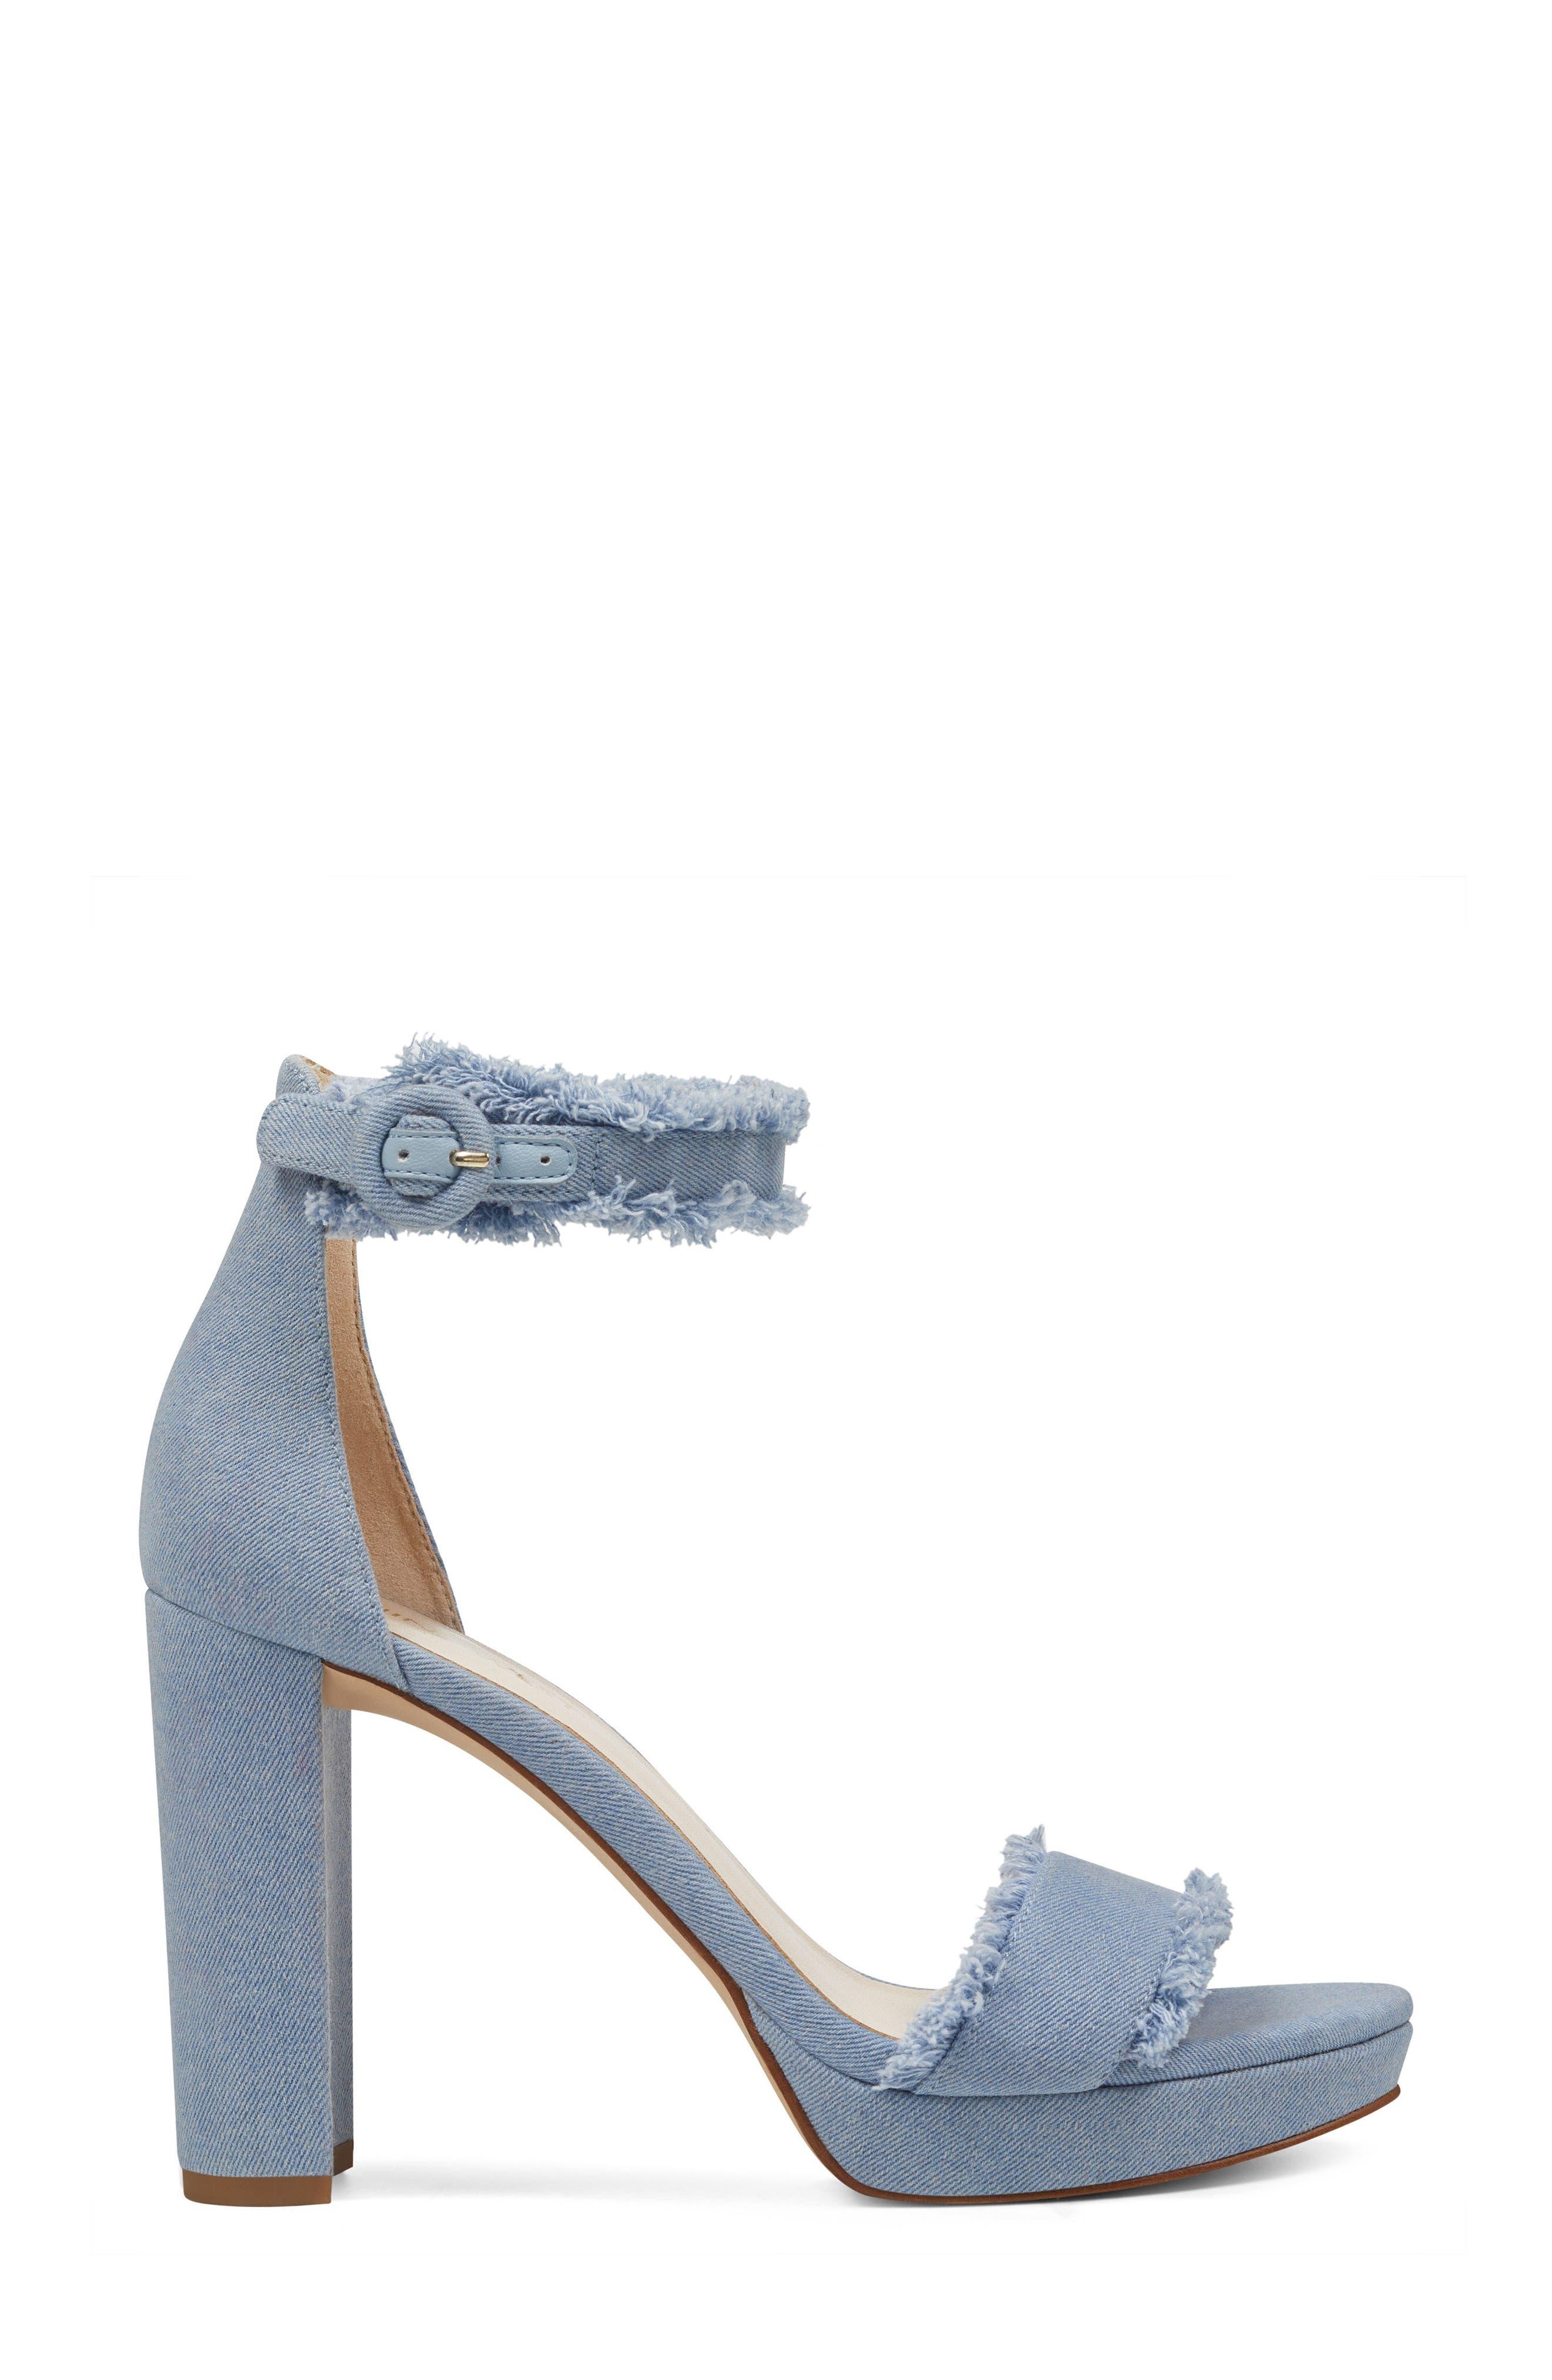 Daranita Ankle Strap Sandal,                             Alternate thumbnail 9, color,